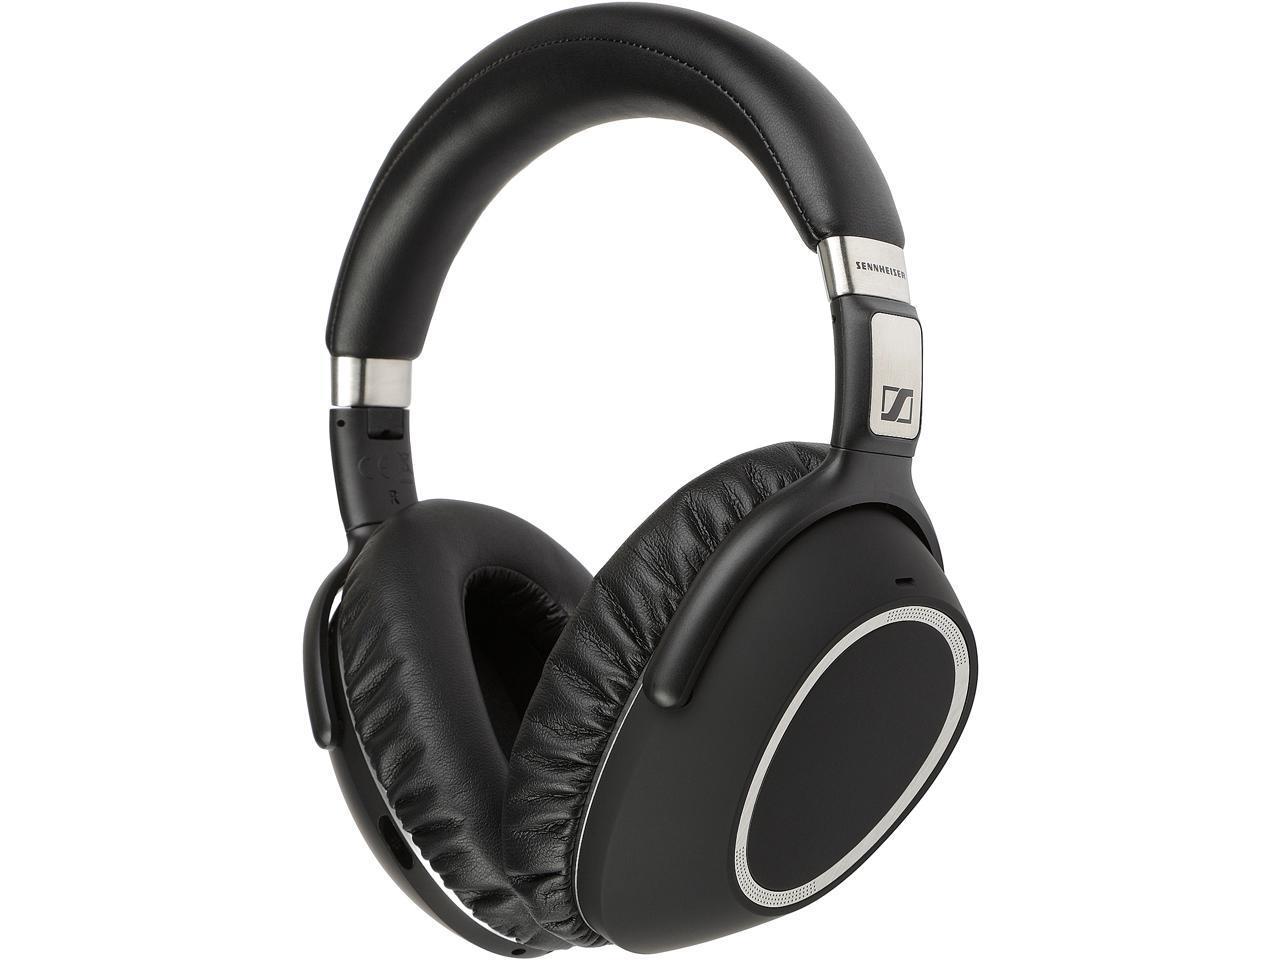 Sennheiser PXC550 Over-Ear 3.5mm Wireless Bluetooth Headphones (Black) + $75 Gift Card